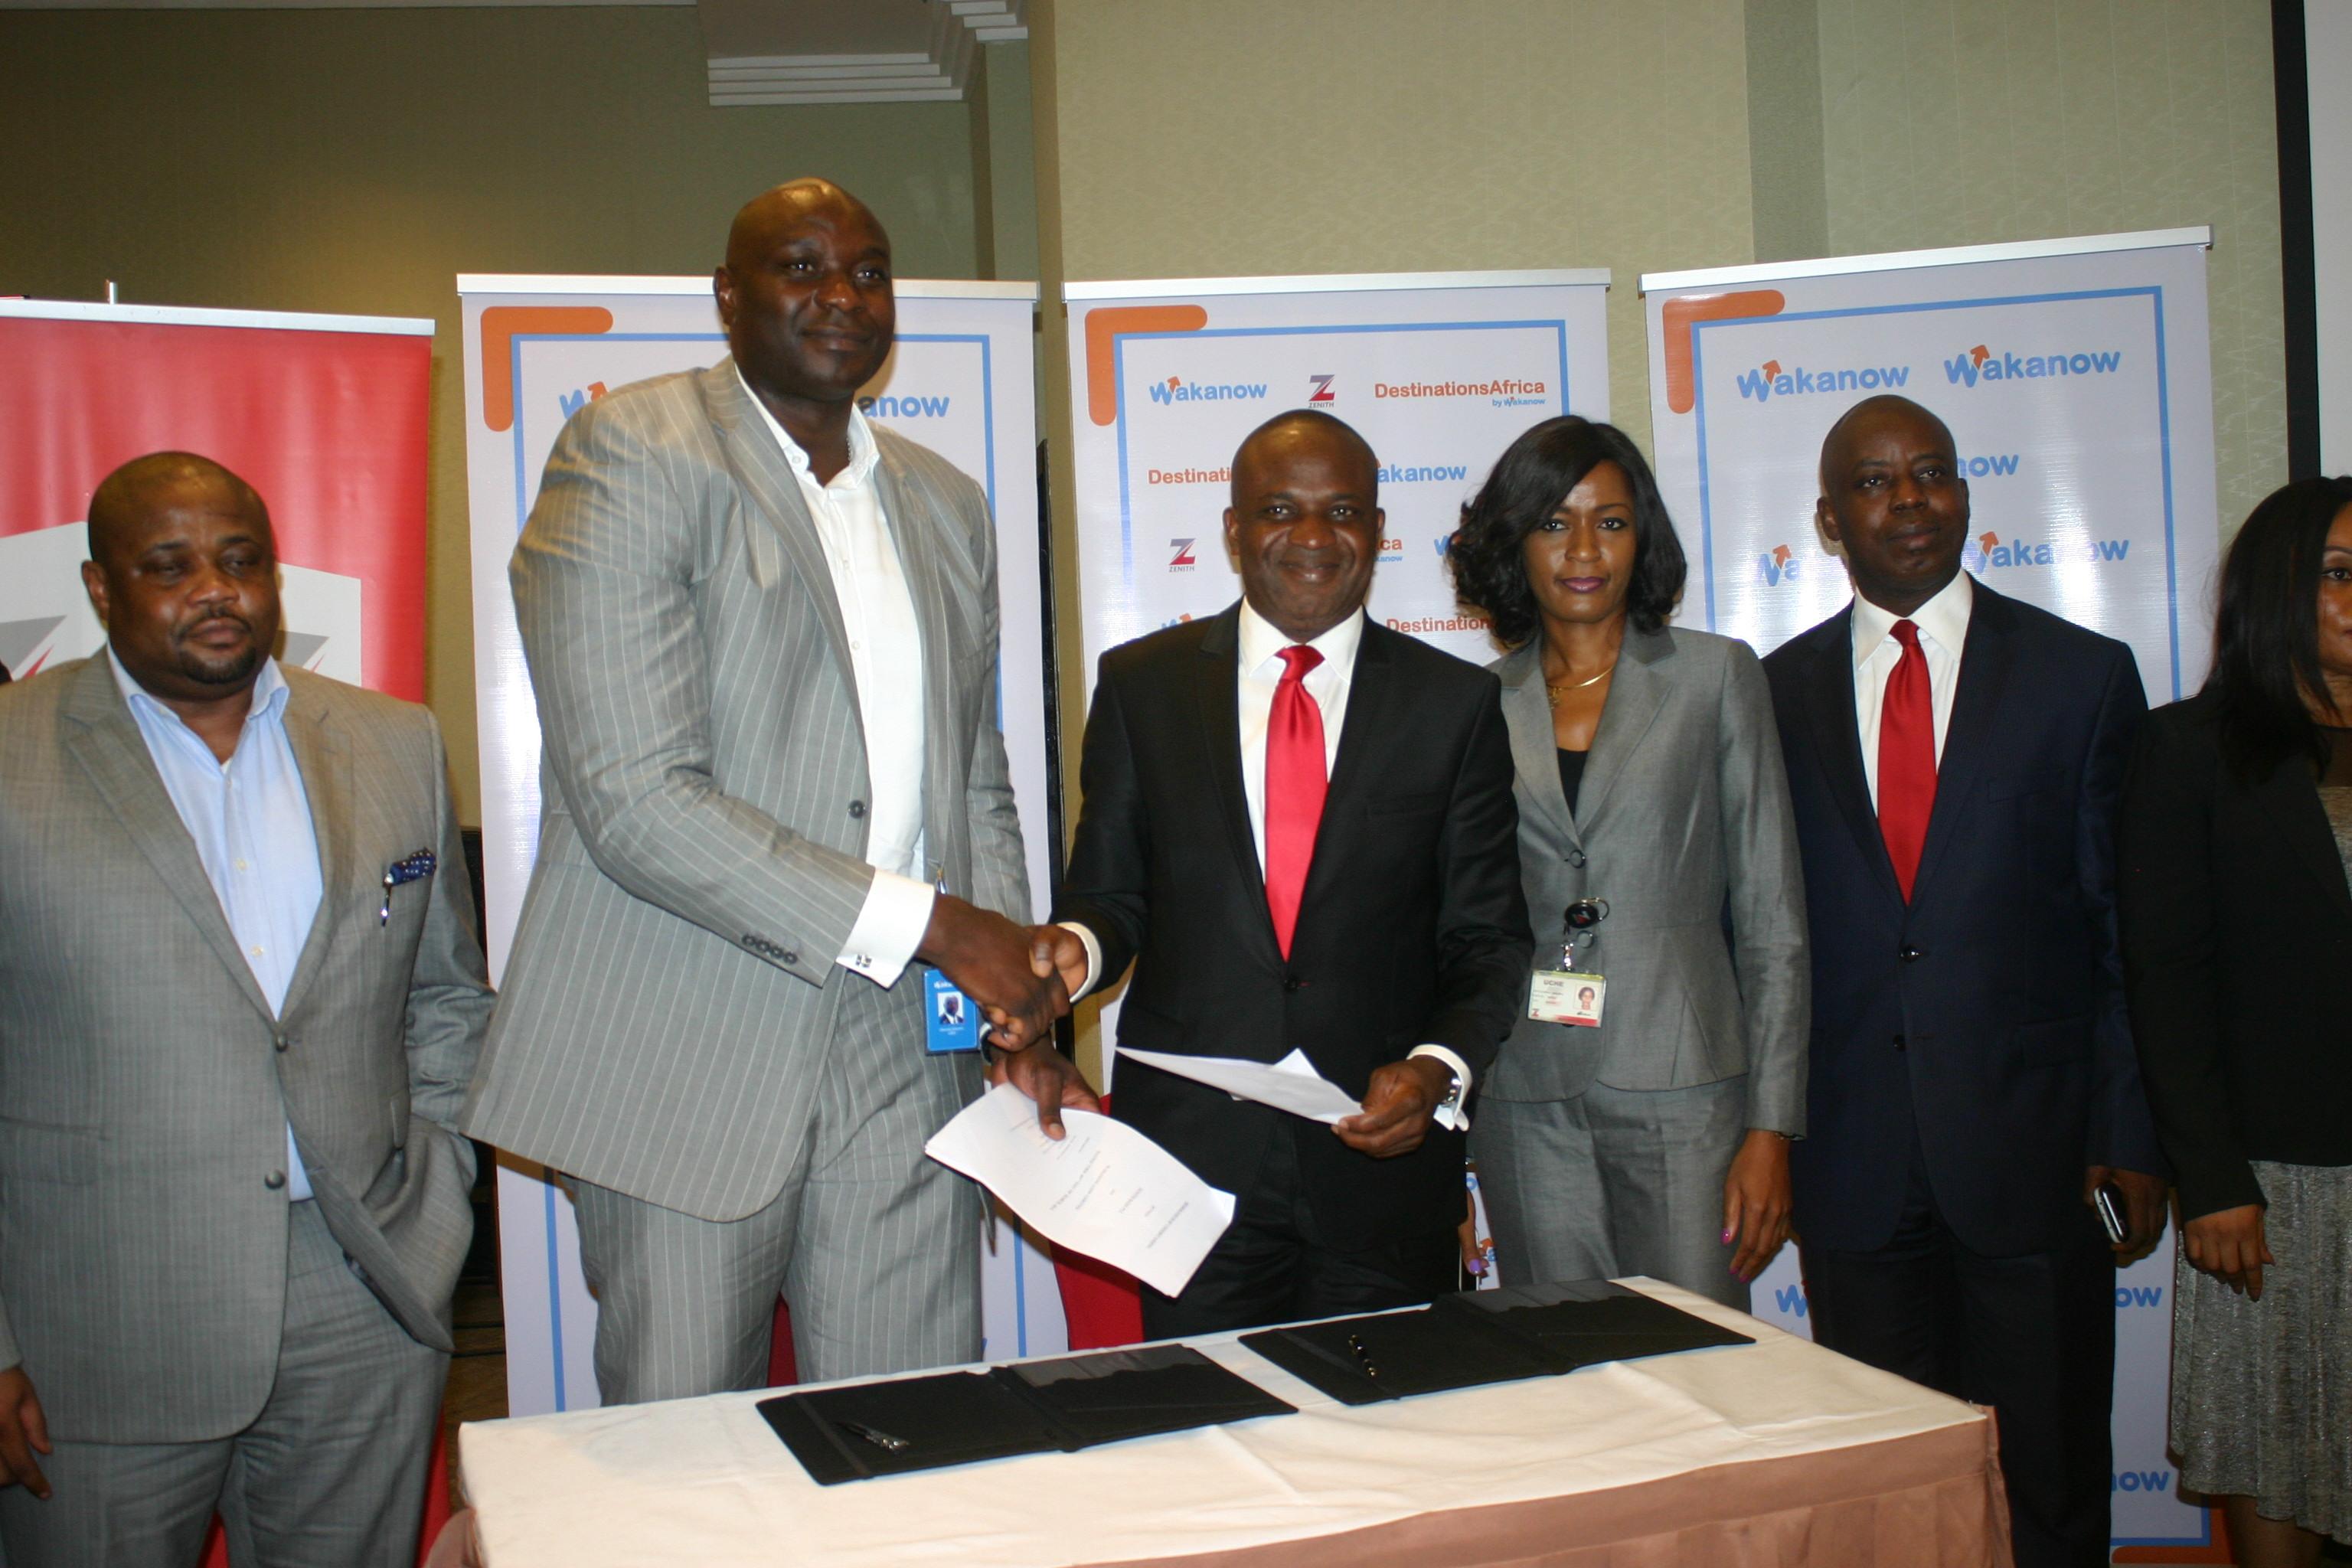 L-R Deputy MD of Wakanow, Ralph Tamuno, MD Wakanow, Obinna Ekezie, Executive Director of Zenith Bank, Sola Oladipo with other staffer of Wakanow